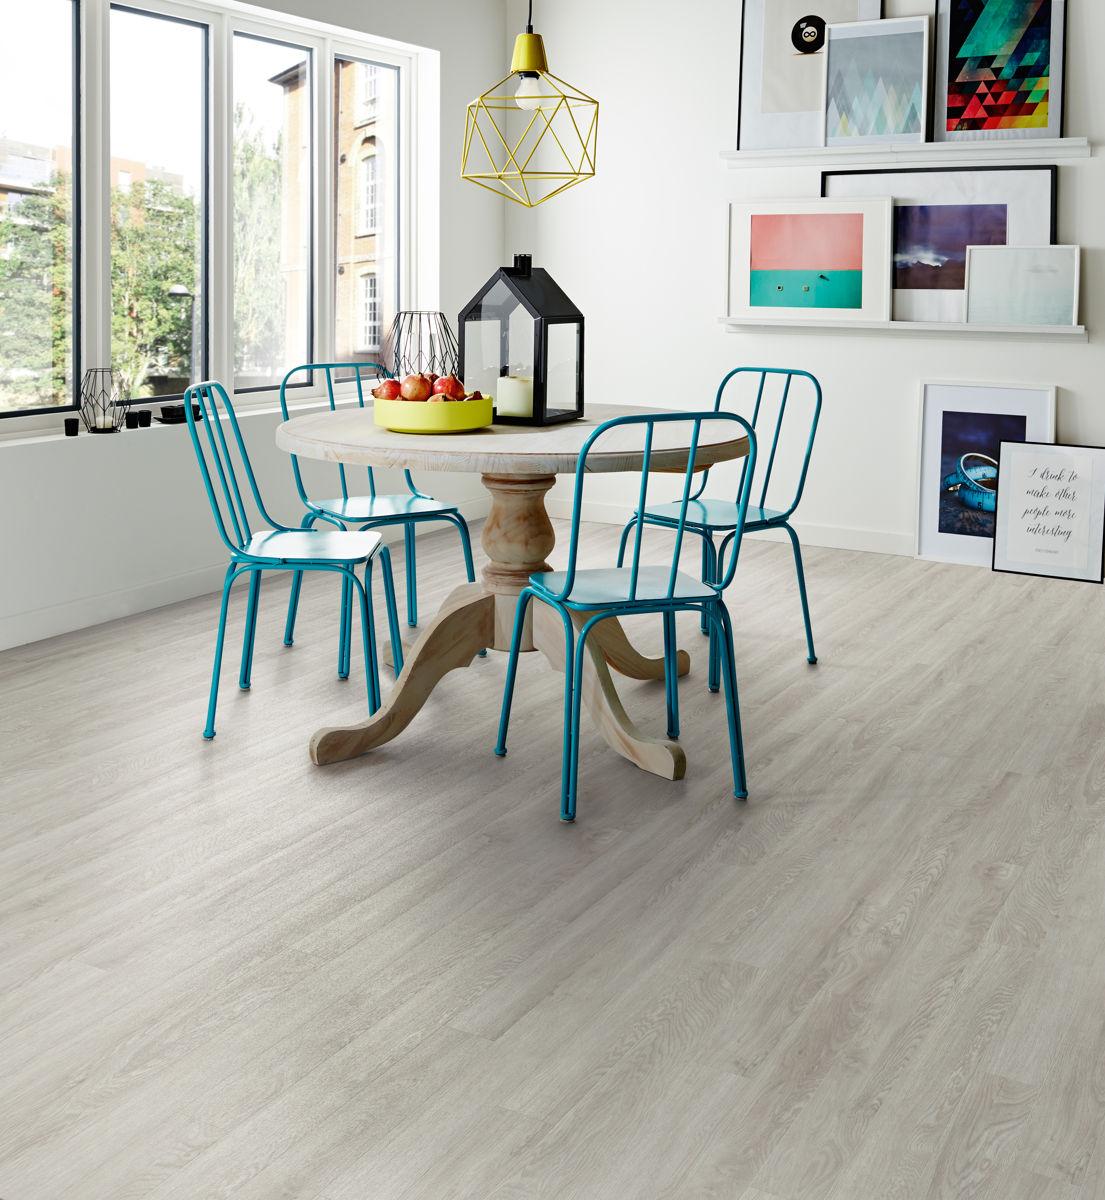 Polyflor Camaro Bianco Oak 2241 Vinyl Flooring